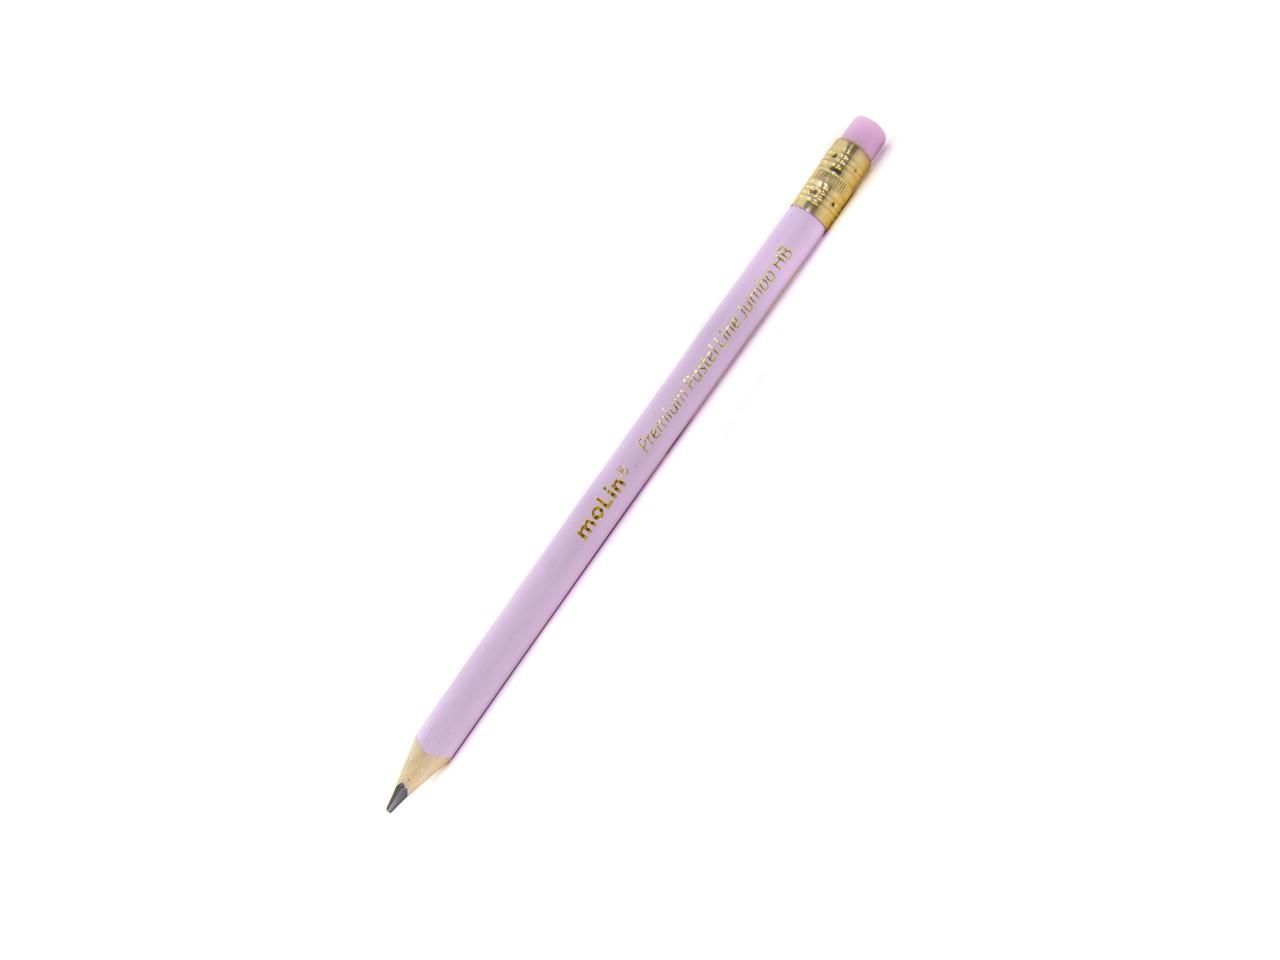 Lápis HP Jumbo Pastel - Lilás Claro